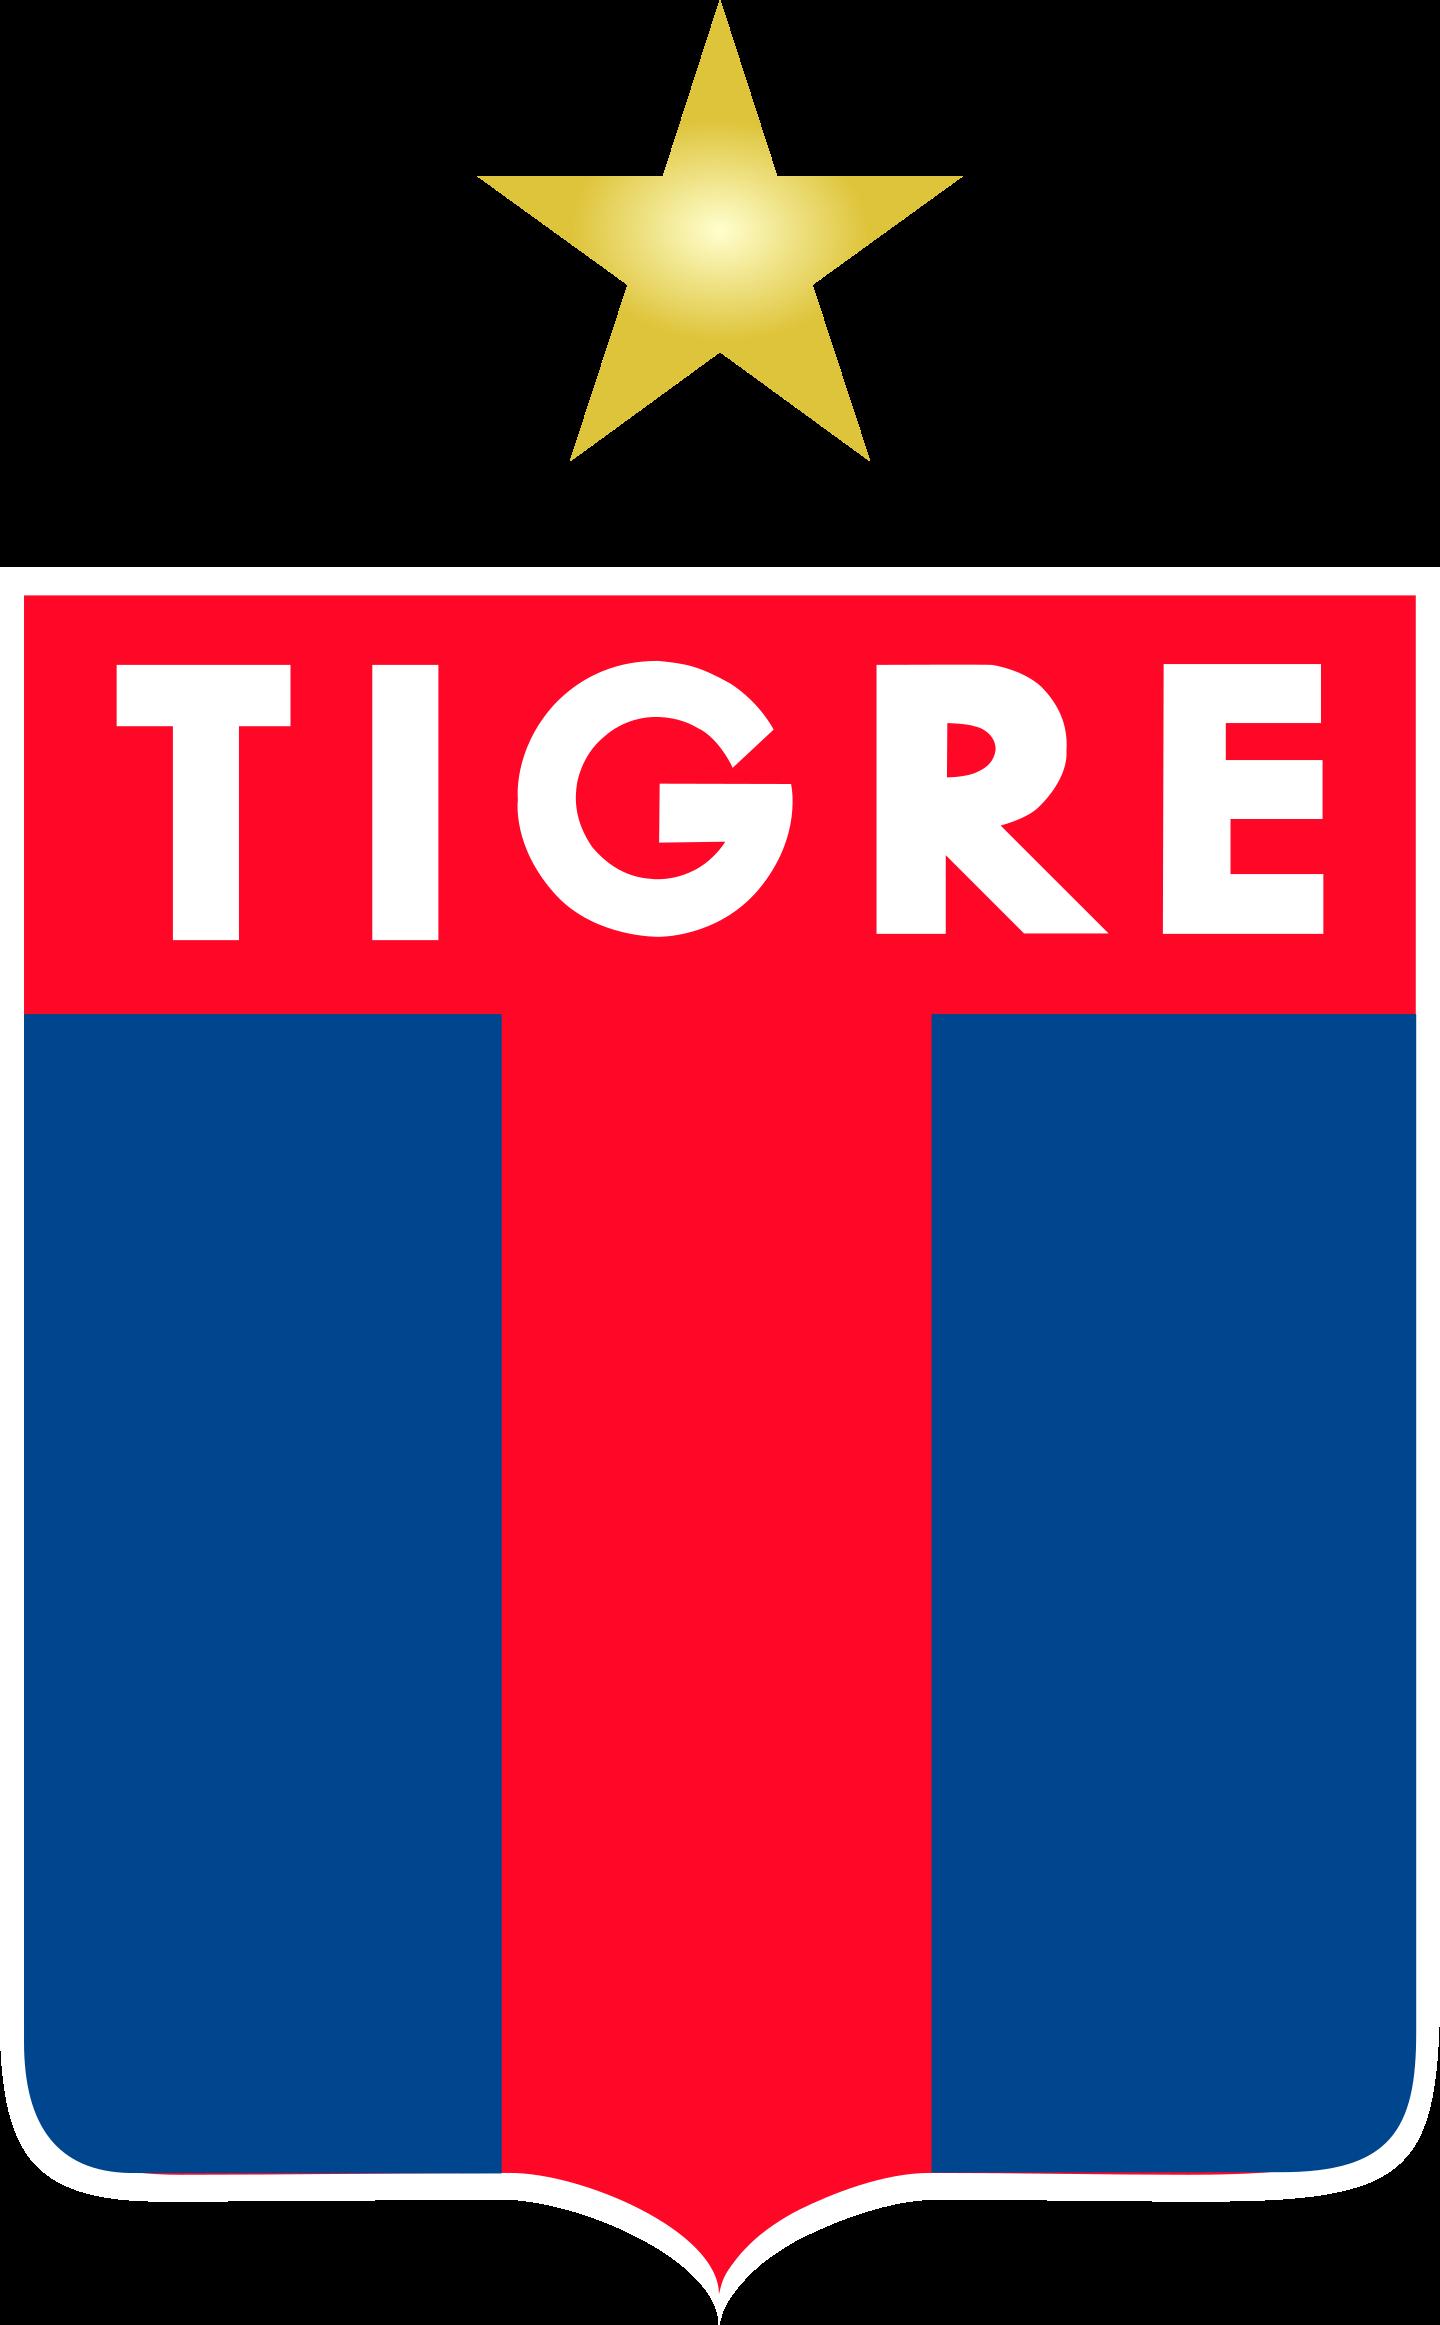 tigre-logo-argentina-2